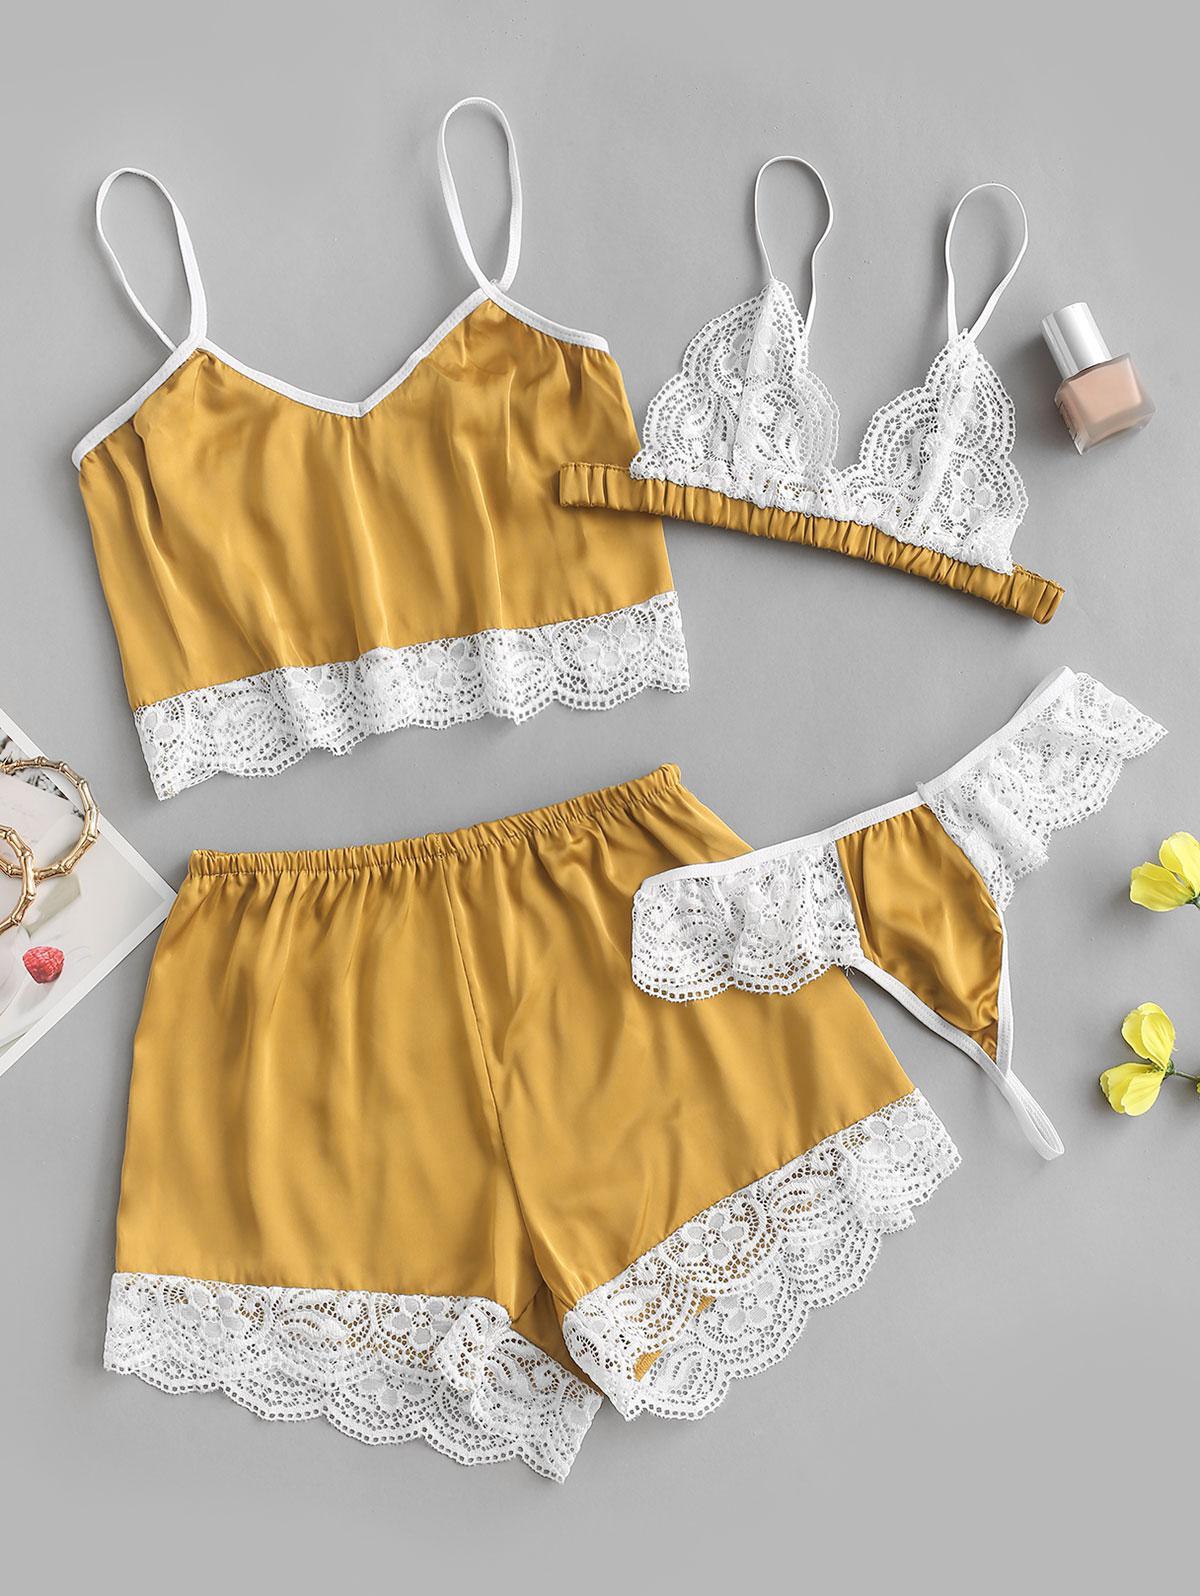 Four Piece Scalloped Lace Trim Satin Lingerie Pajama Set